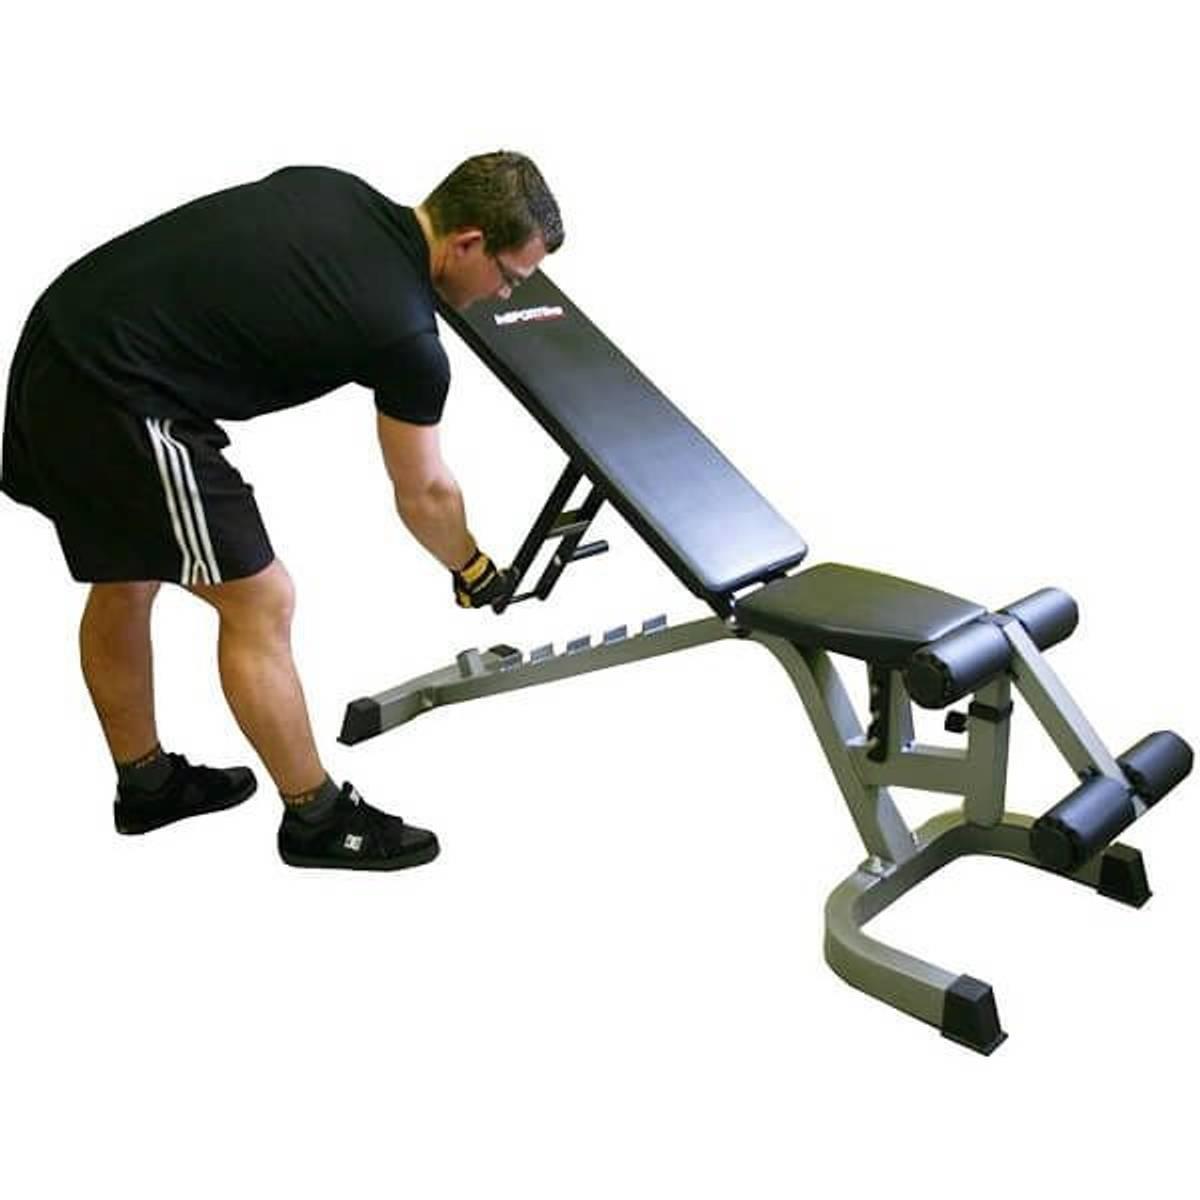 InSPORTline Sit up treningsbenk Profi